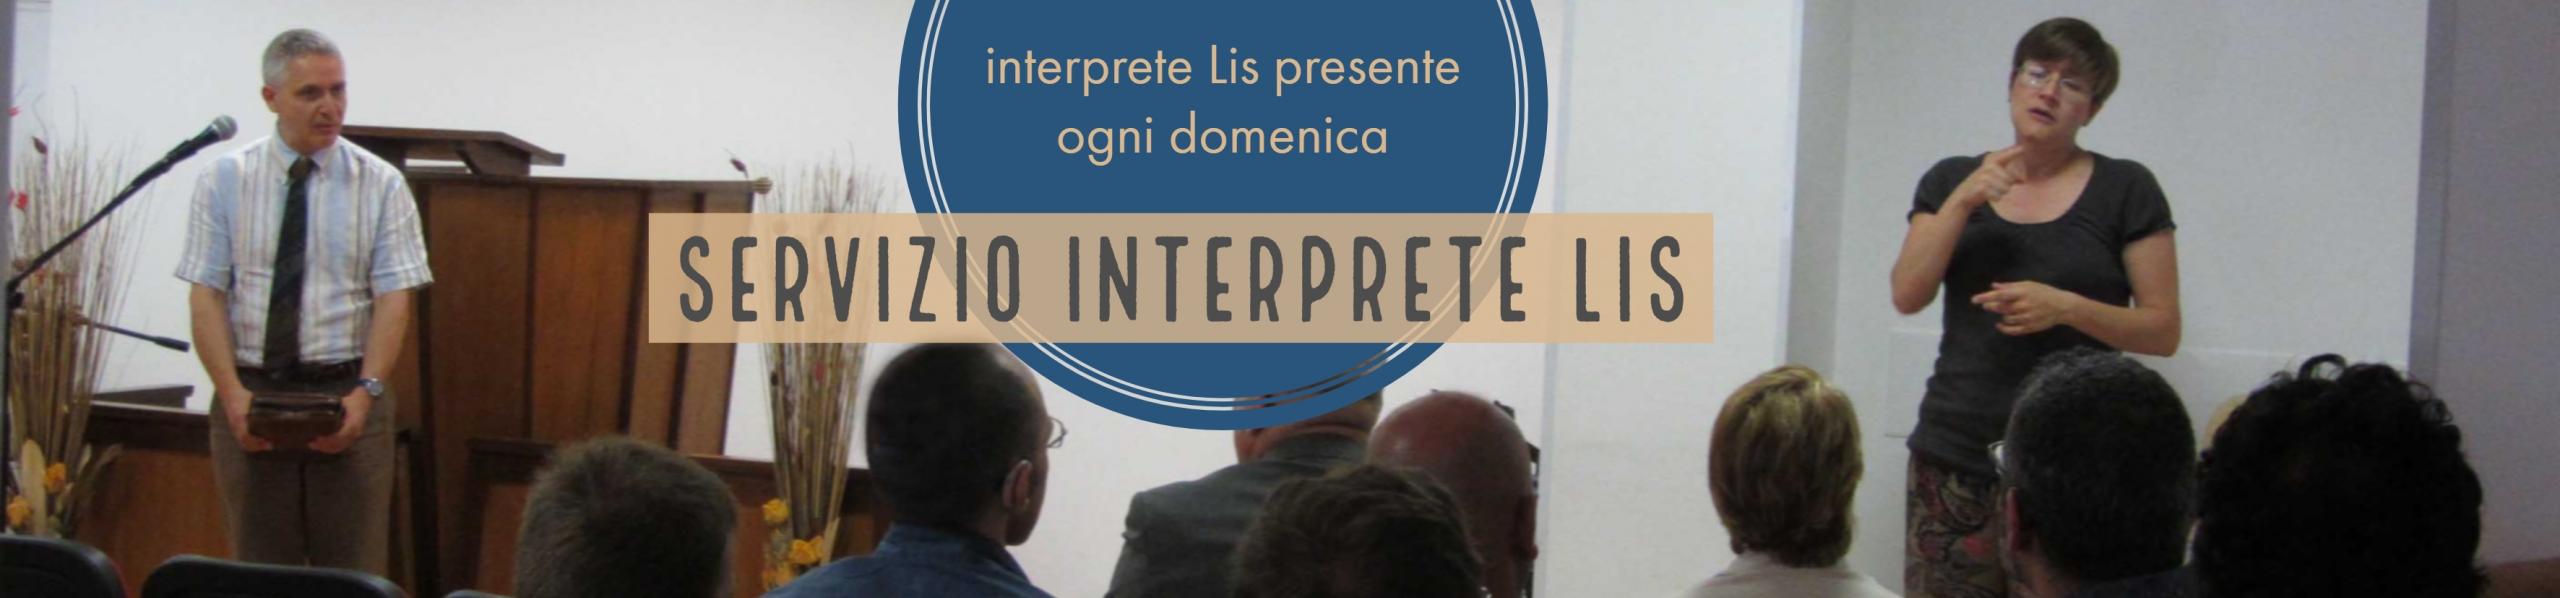 banner servizio interprete lis